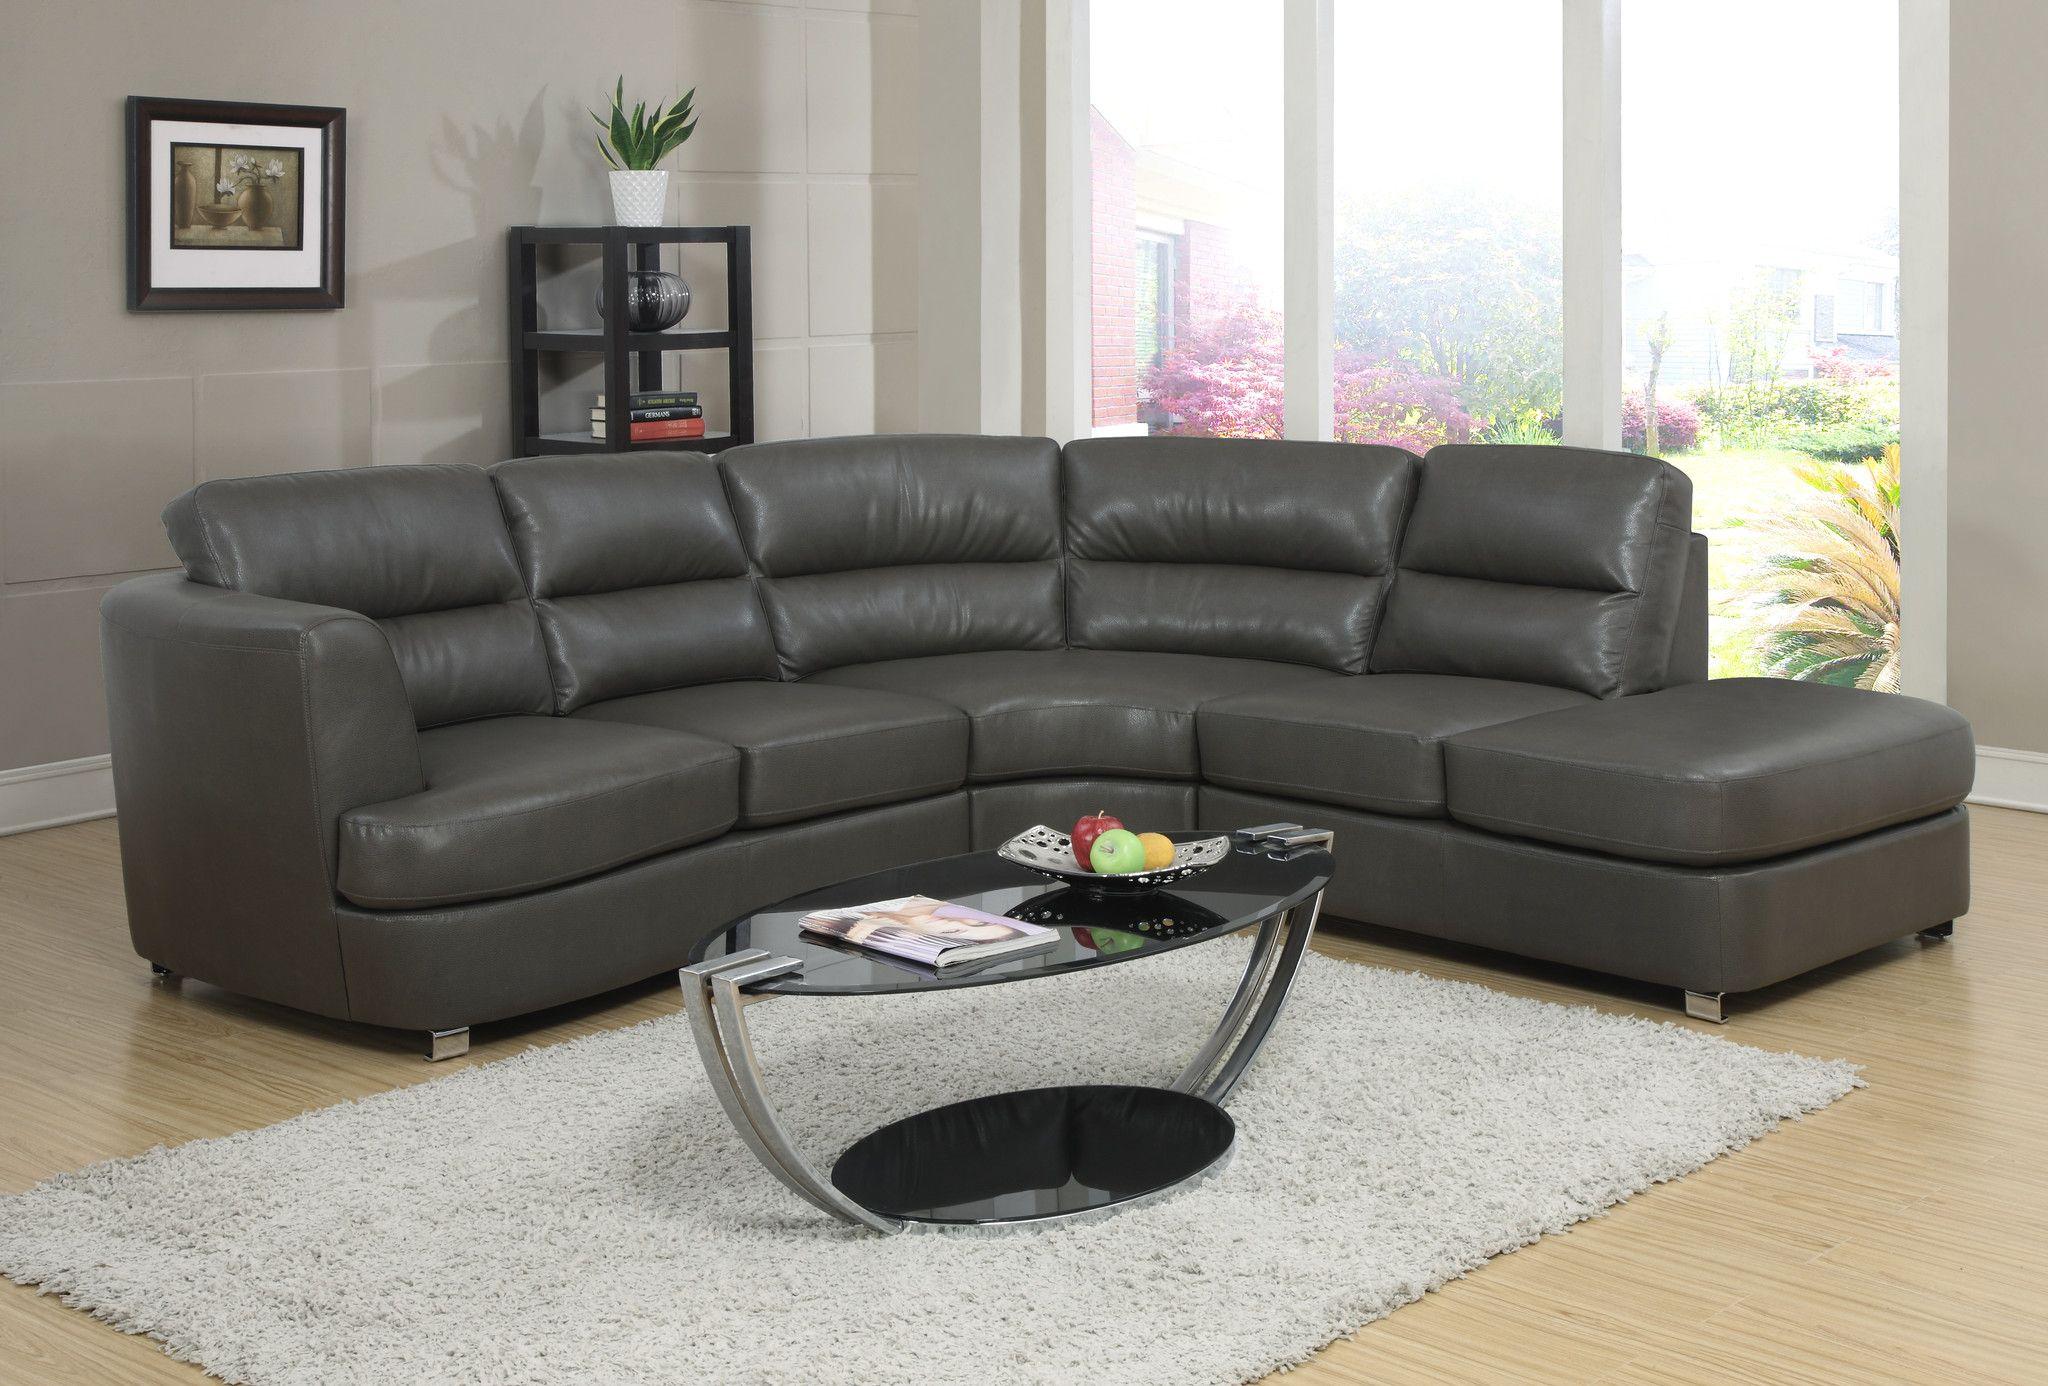 grey leather sofas harveys best wooden furniture sofa set sectional dark bonded  harvey